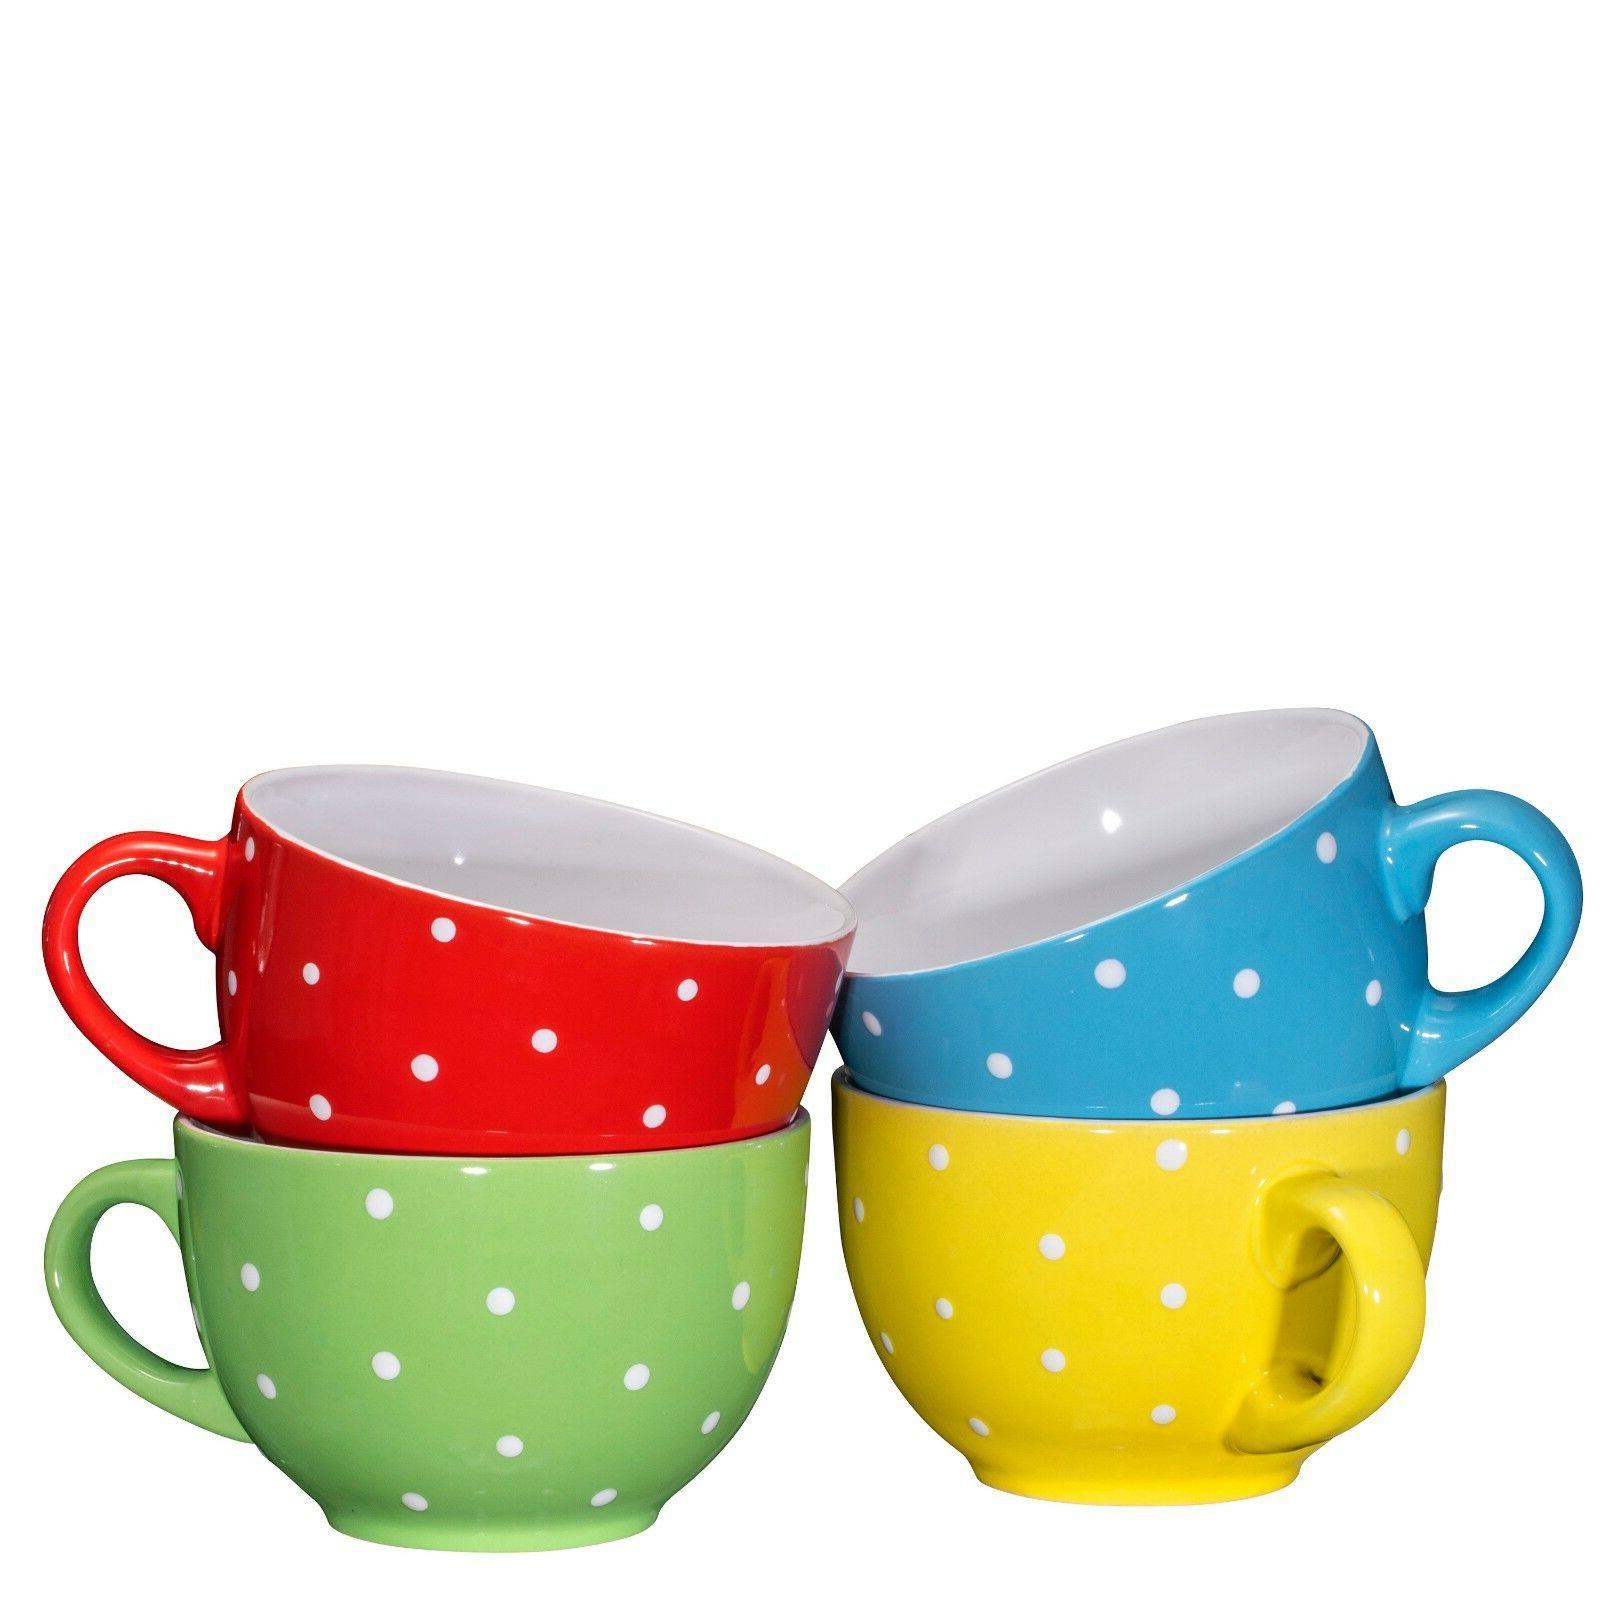 Bruntmor Cereal Coffee Mug 24 Set